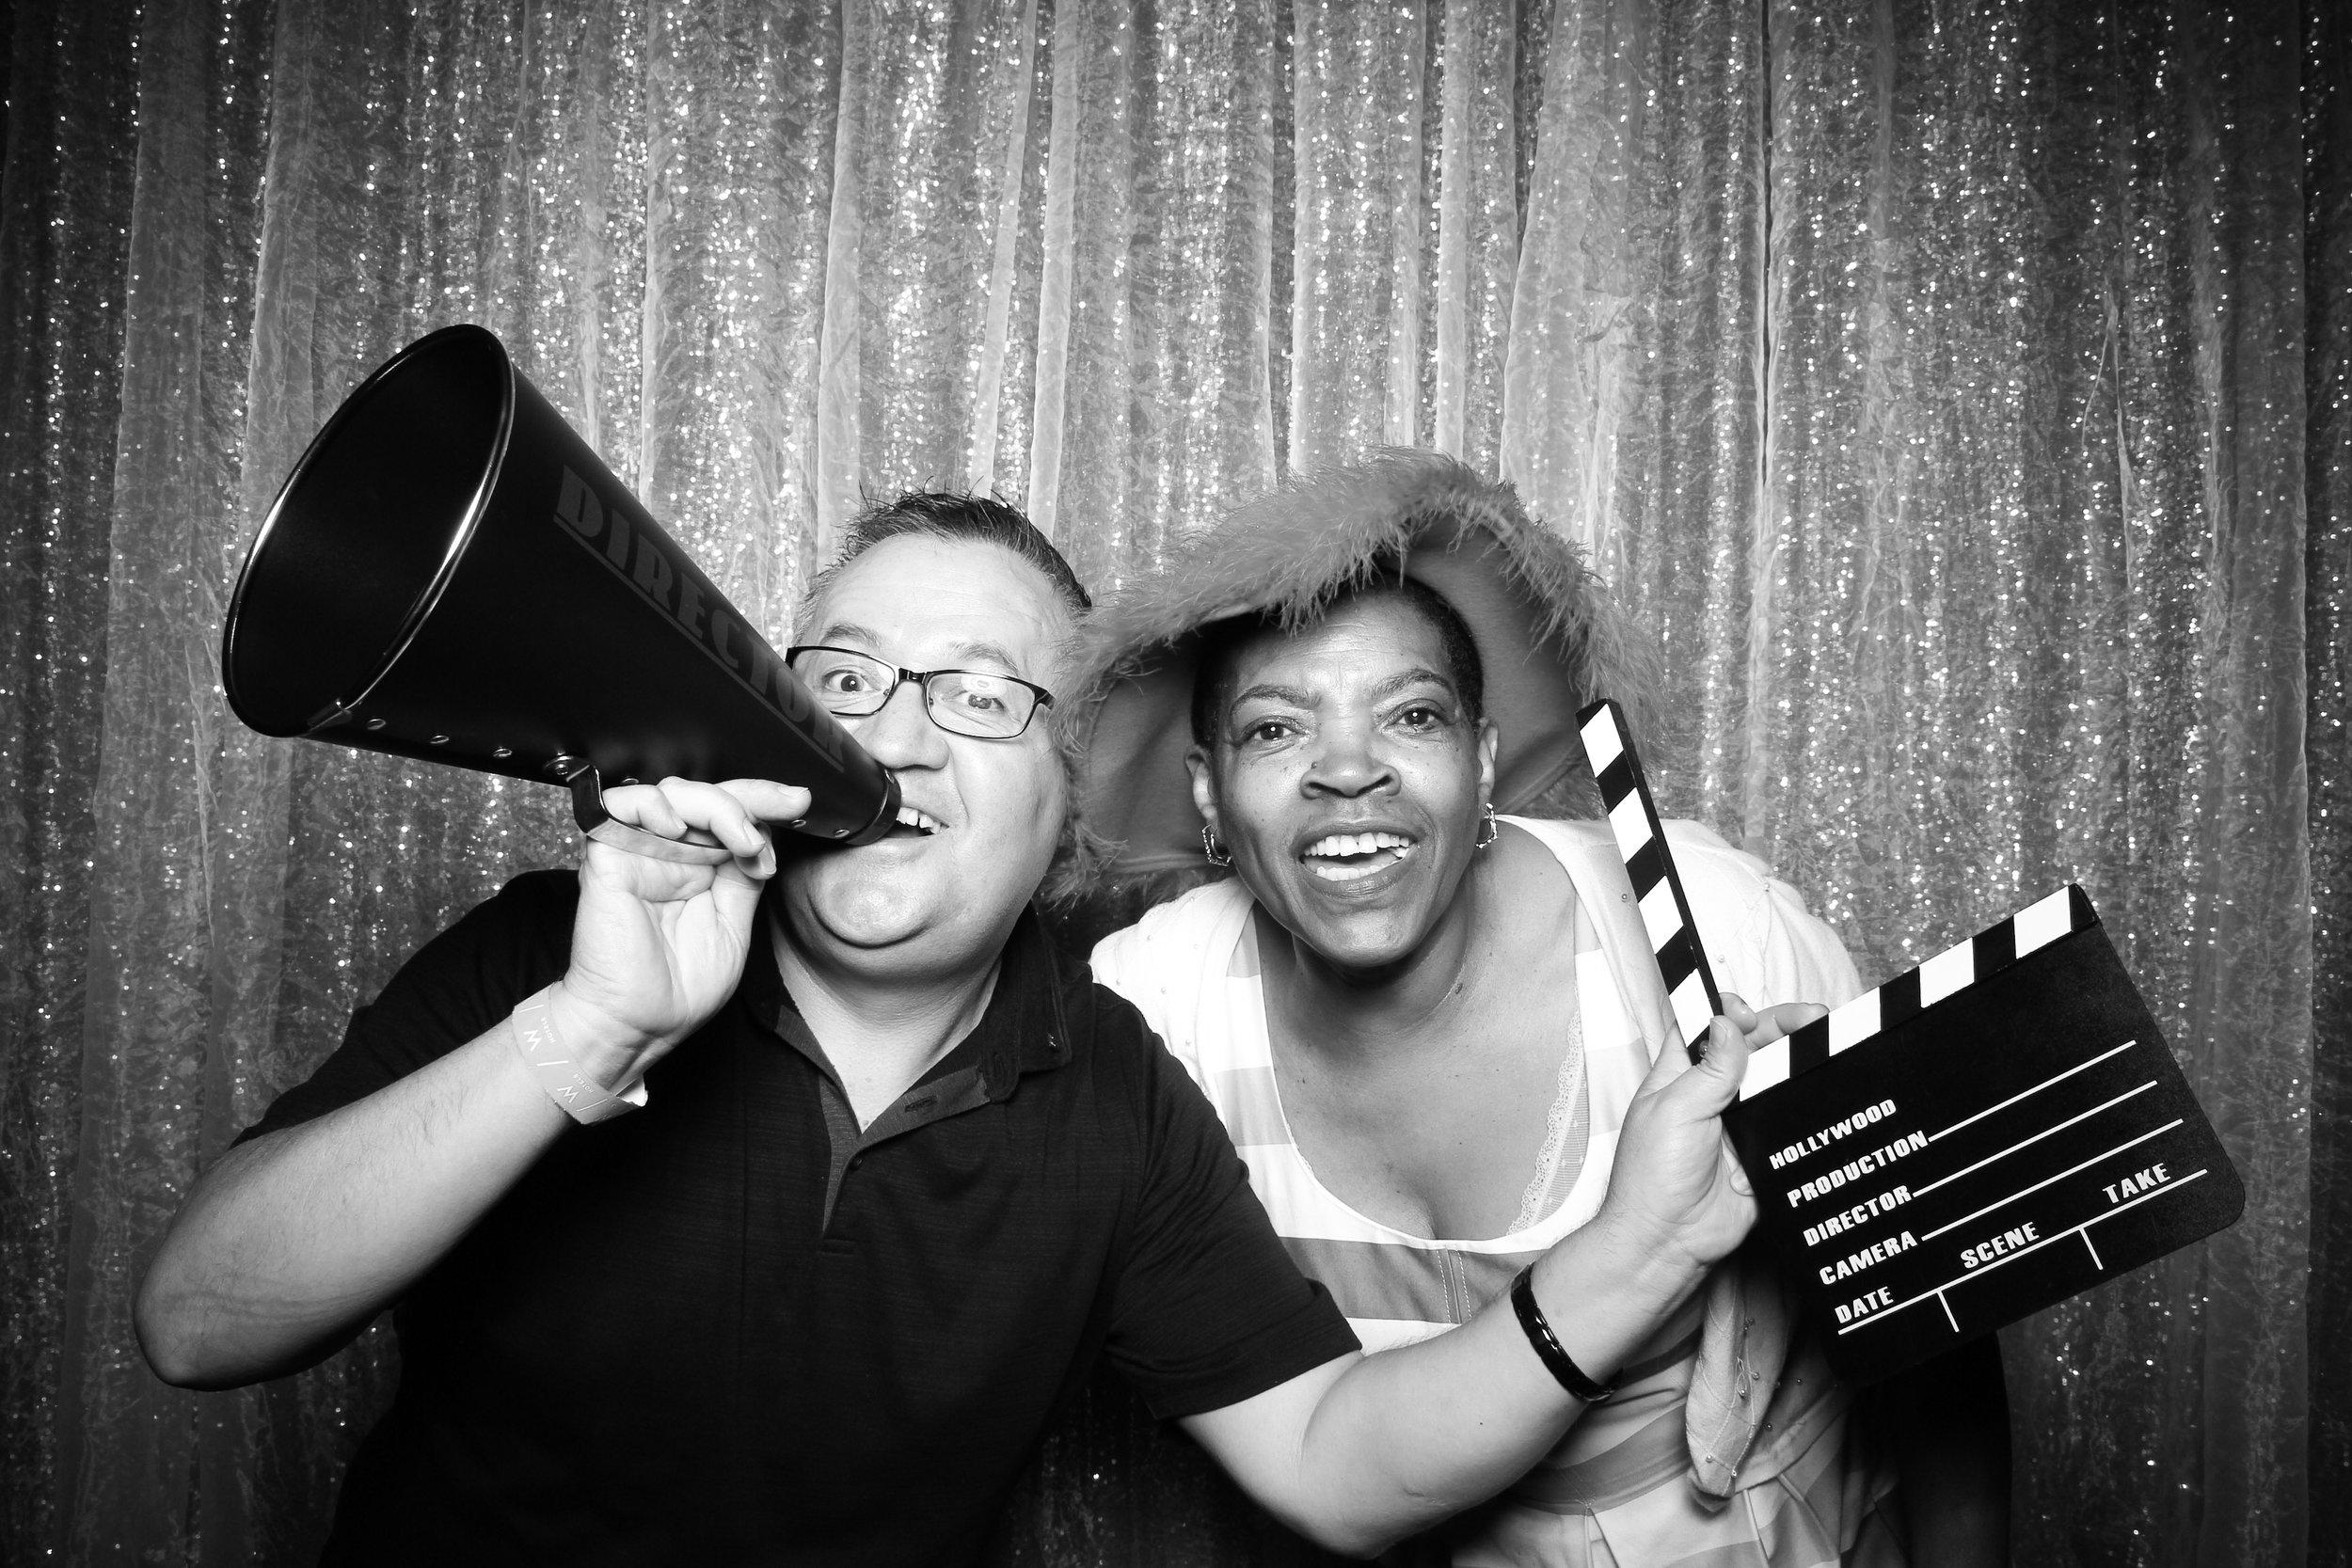 Chicago_Vintage_Wedding_Photobooth_W_Lakeshore_Hotel_18.jpg